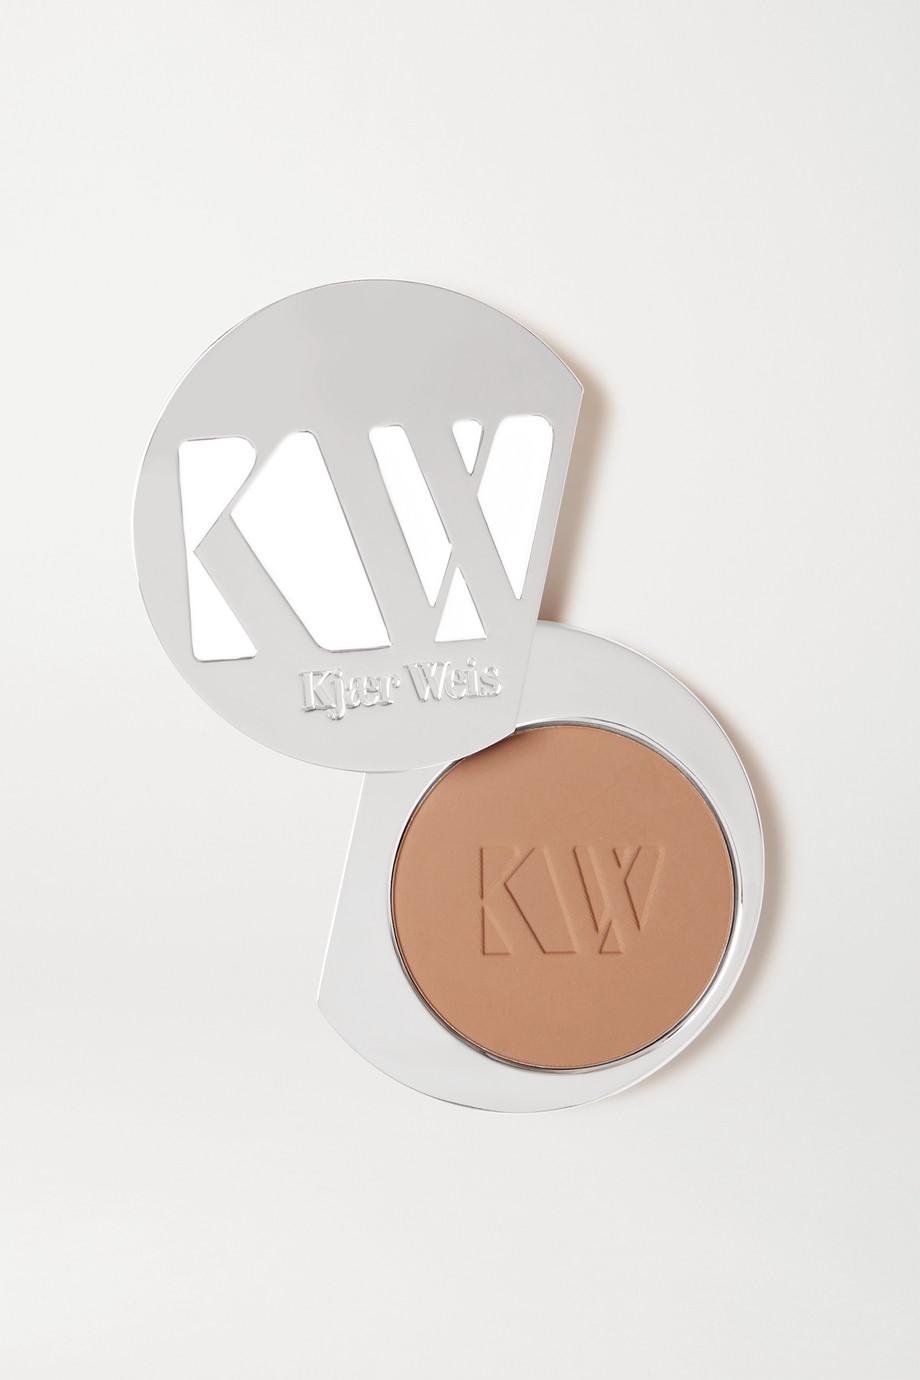 Kjaer Weis Pressed Powder - Faint